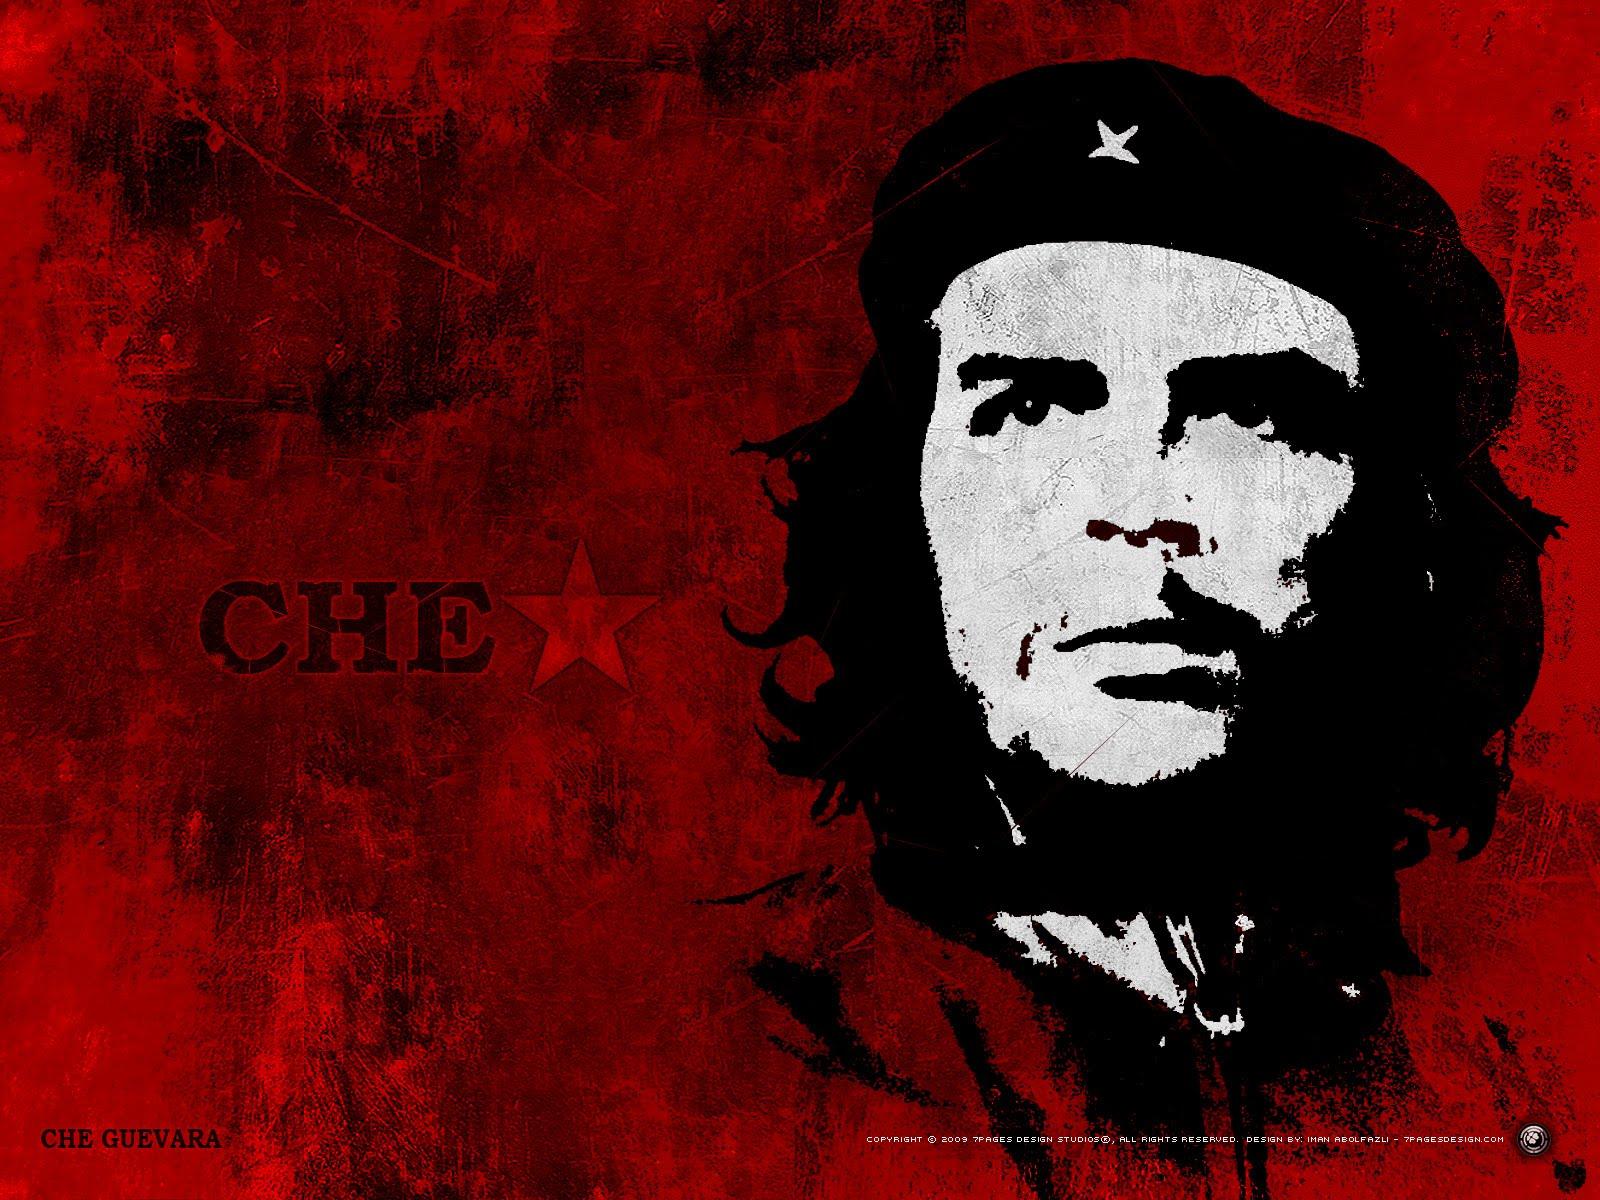 http://2.bp.blogspot.com/-WGcAc_SPSqQ/TcrORmrLHDI/AAAAAAAAAh4/7VOor2Nlosw/s1600/Che-Guevara-Hot-Wallpapers.jpg